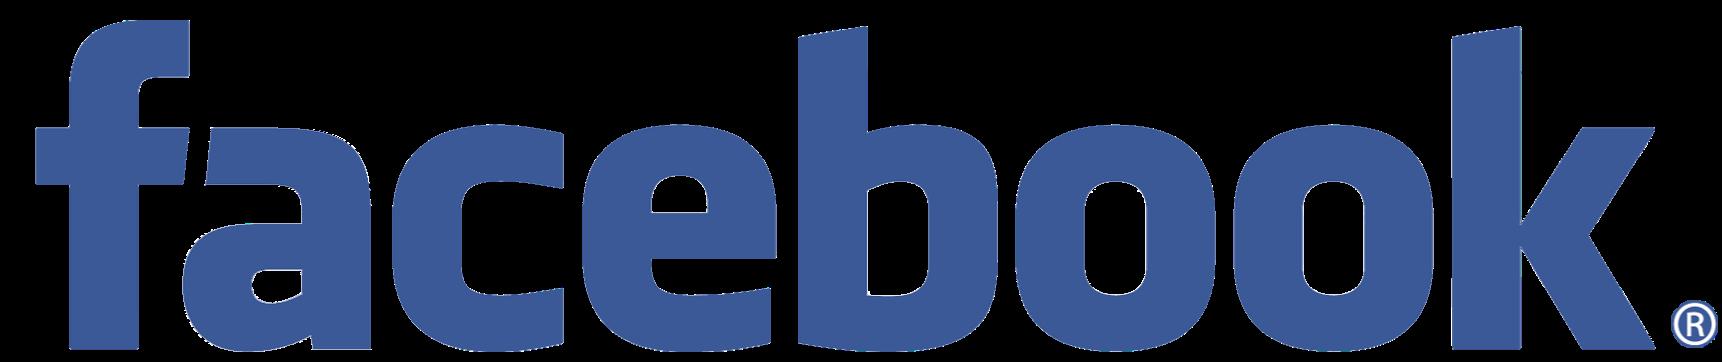 Structsales Facebook